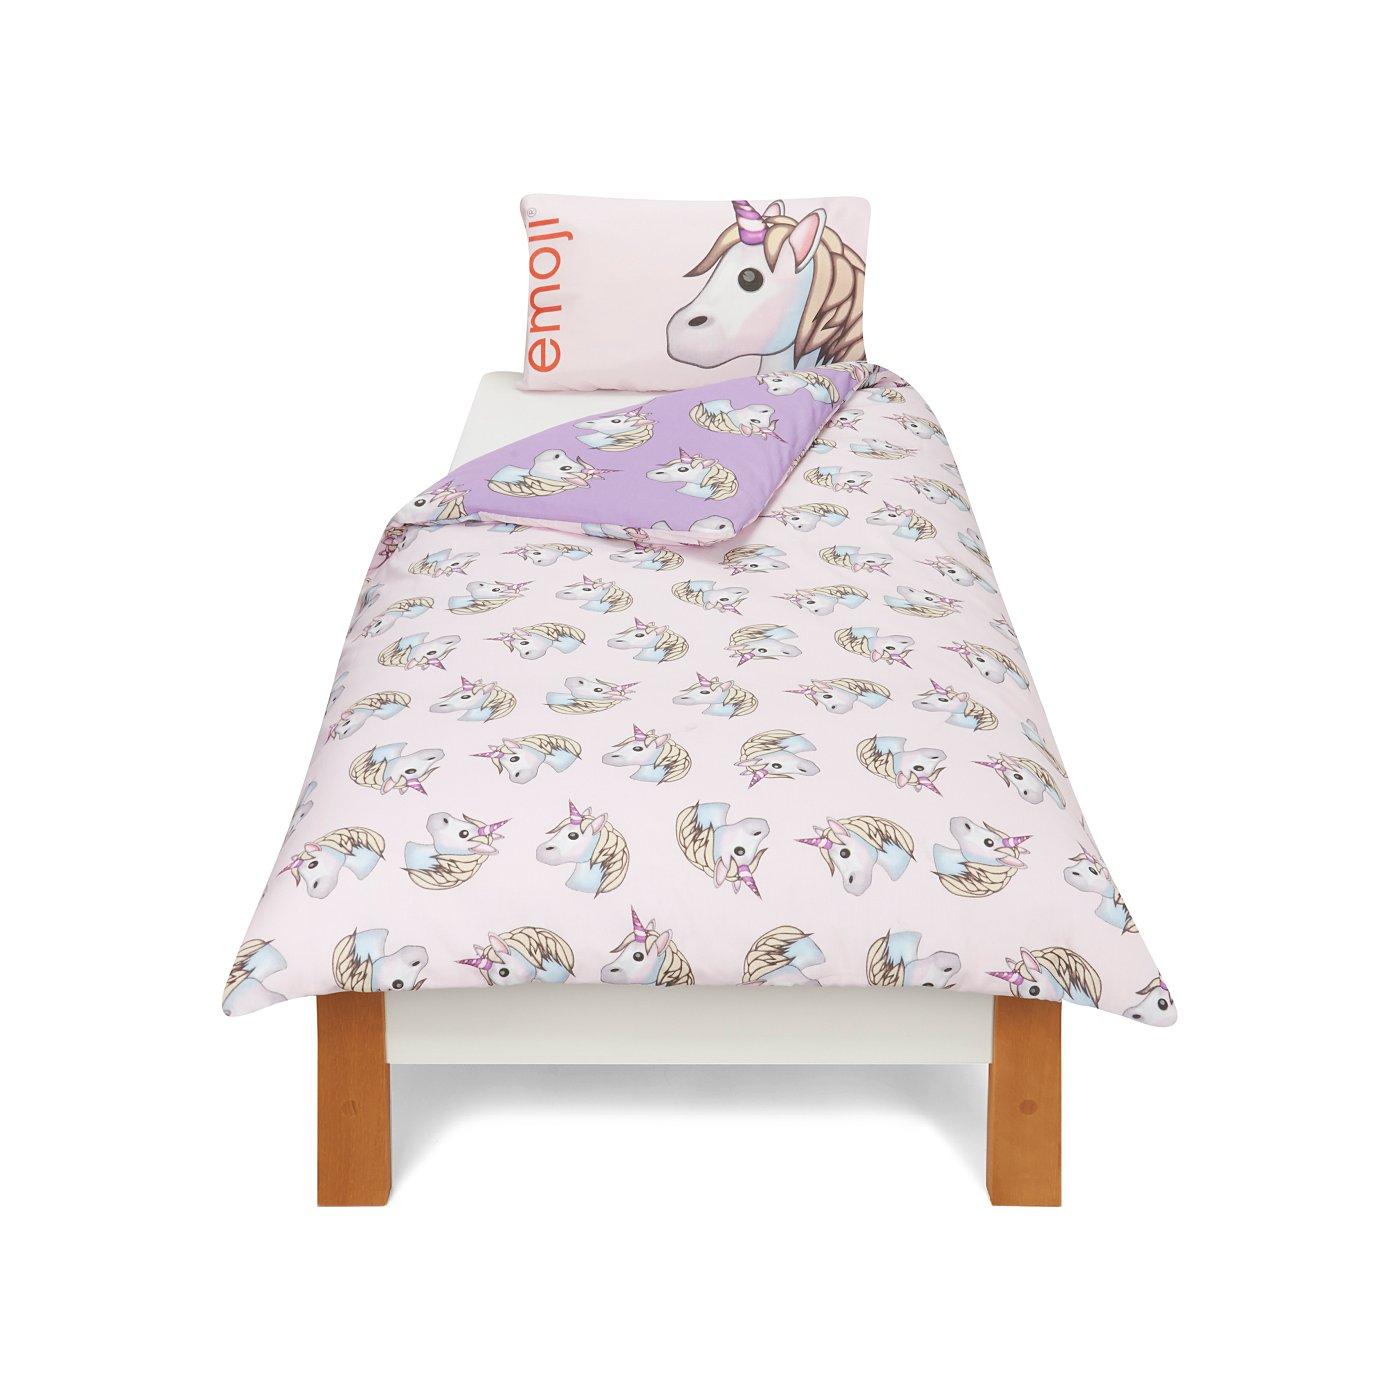 systems solar sets linnlive cover bedding itm new cot unicorn junior images duvet com dinosaur toddler bed